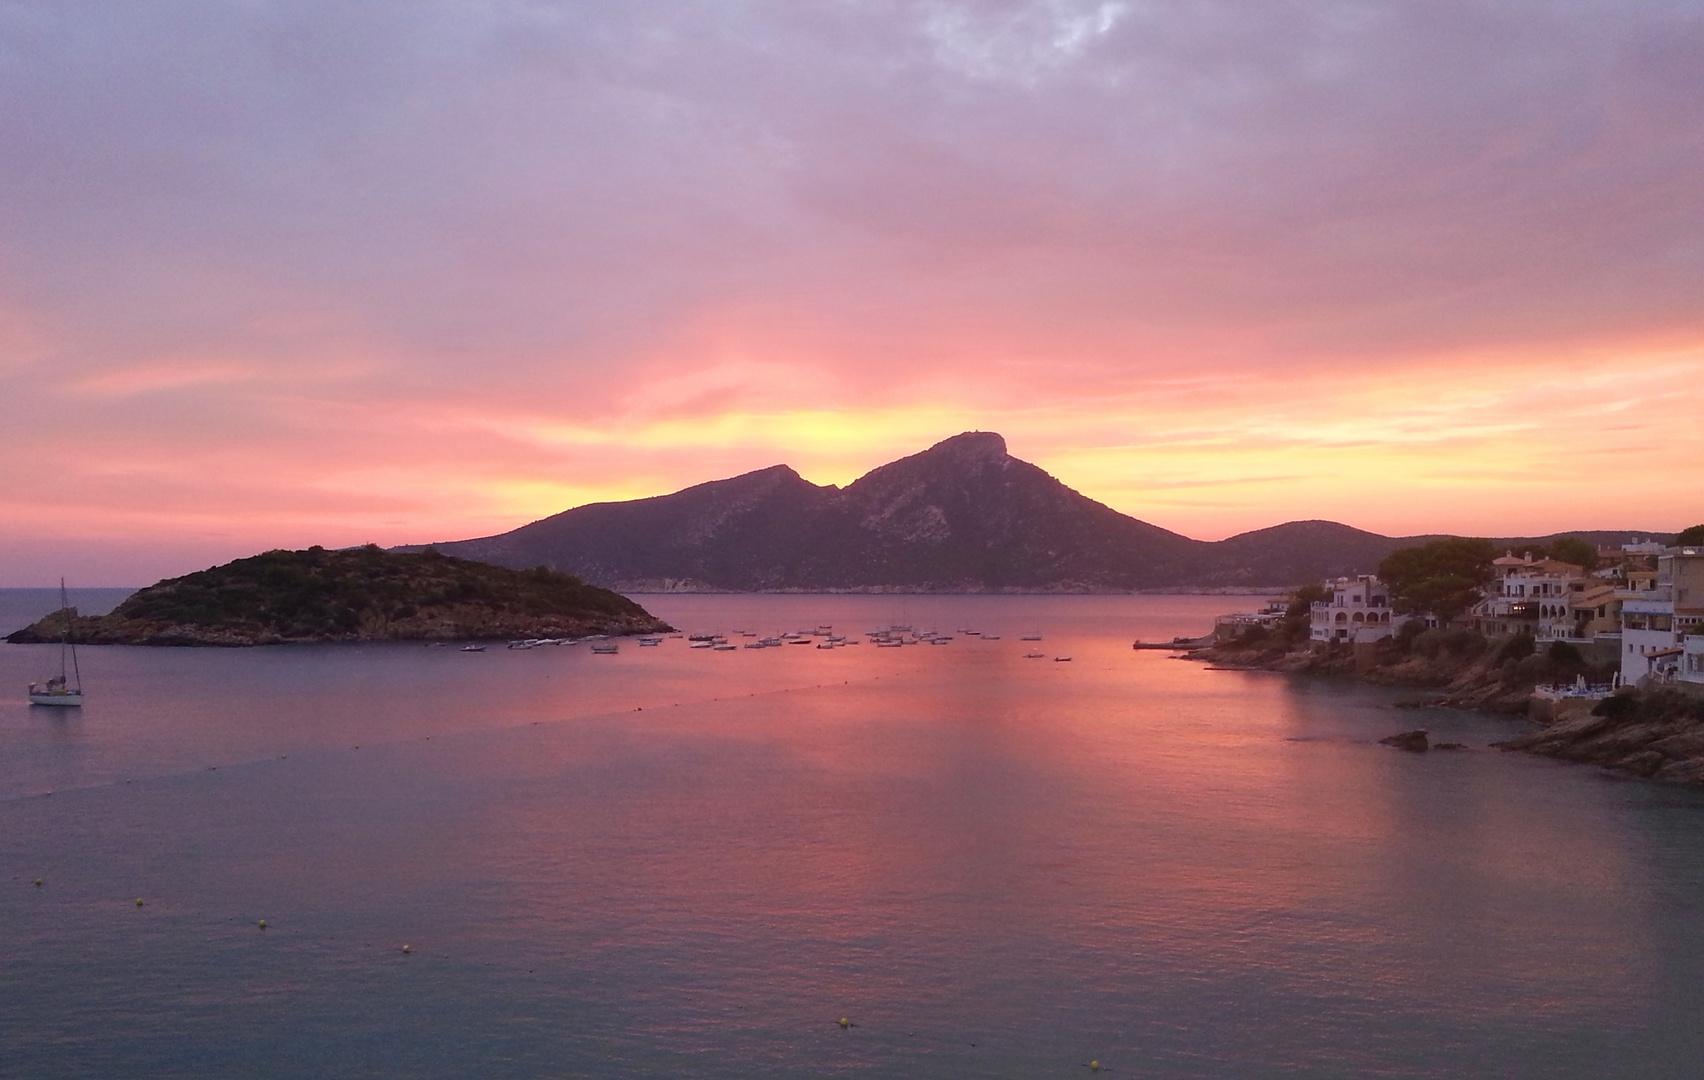 Sonnenuntergang am 30.08.2013 in San Telm